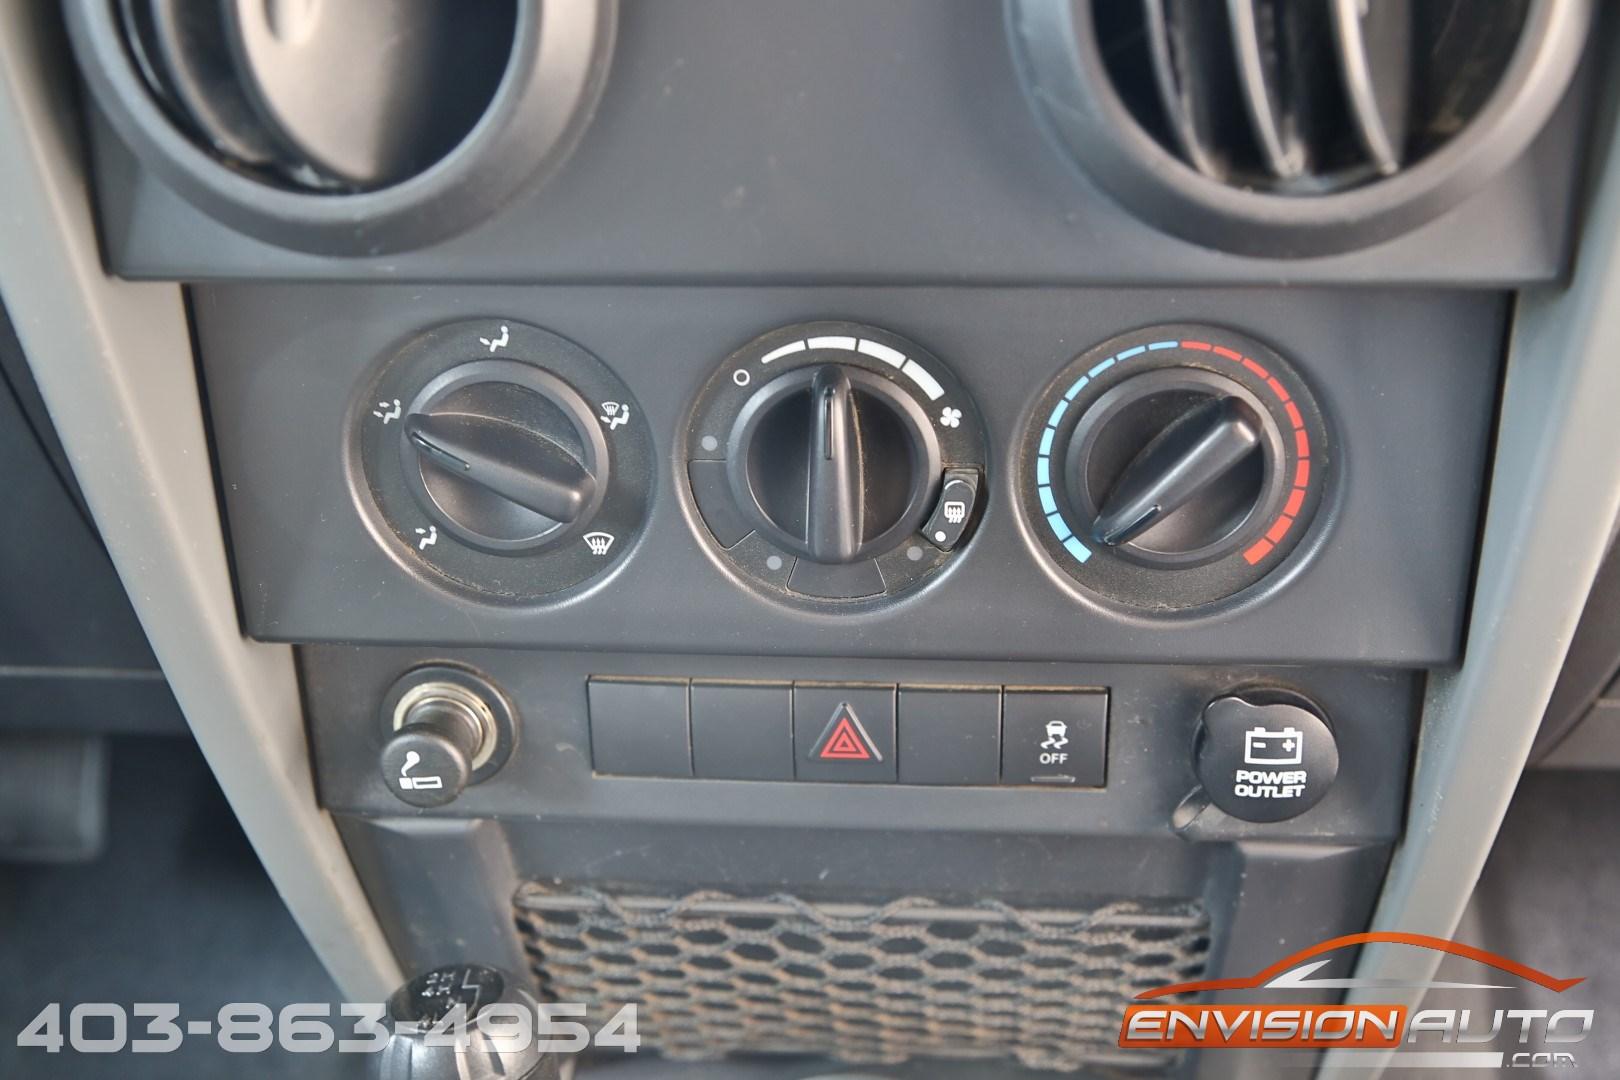 2010 Jeep Wrangler Custom Lift Winch Bumper Led Lights